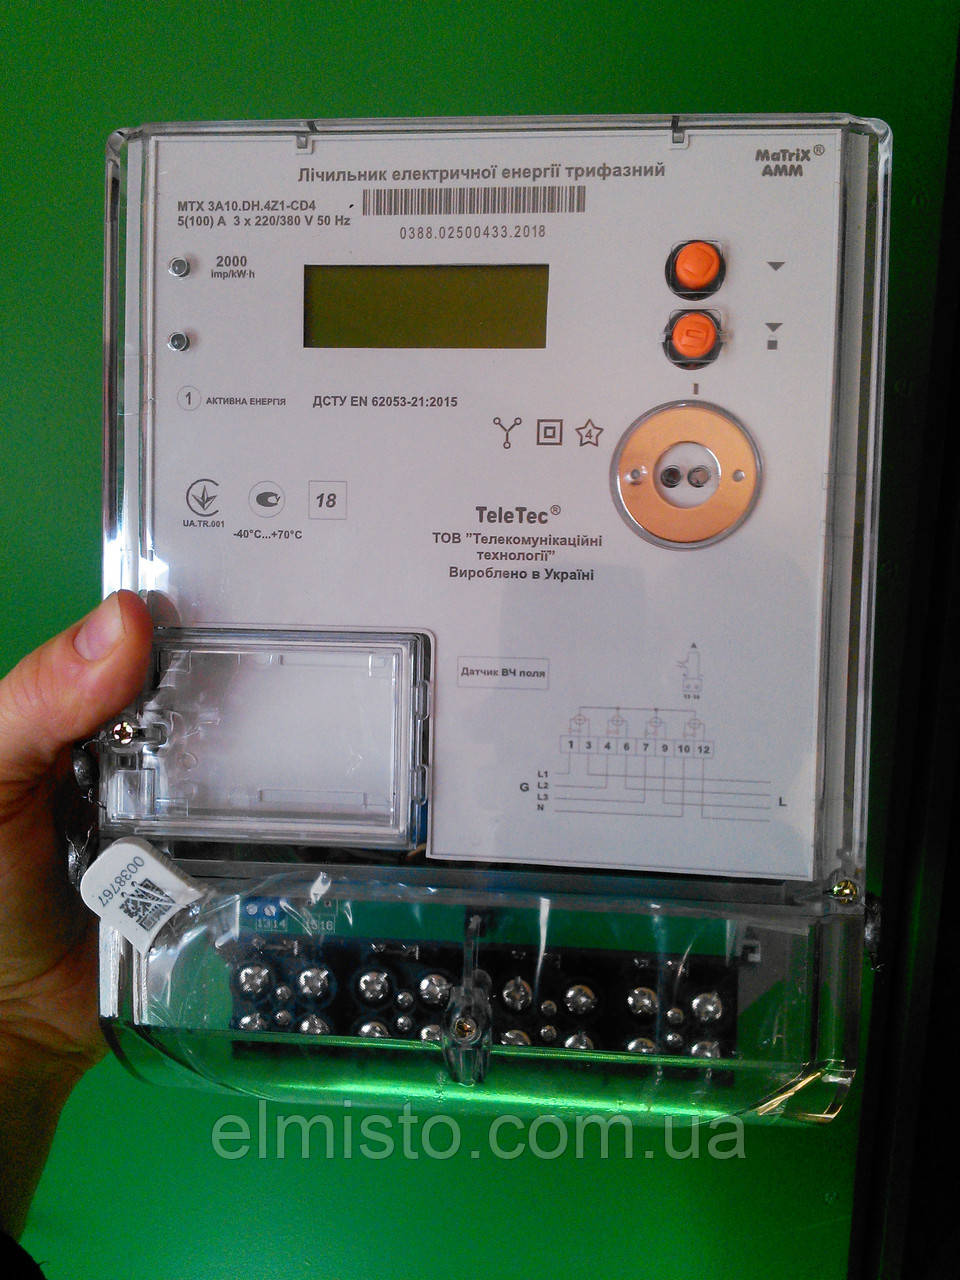 Электросчетчик MTX 3A10.DH.4Z1-СD4 3ф.5(100)А,  A+, датчик магн.поля, без реле